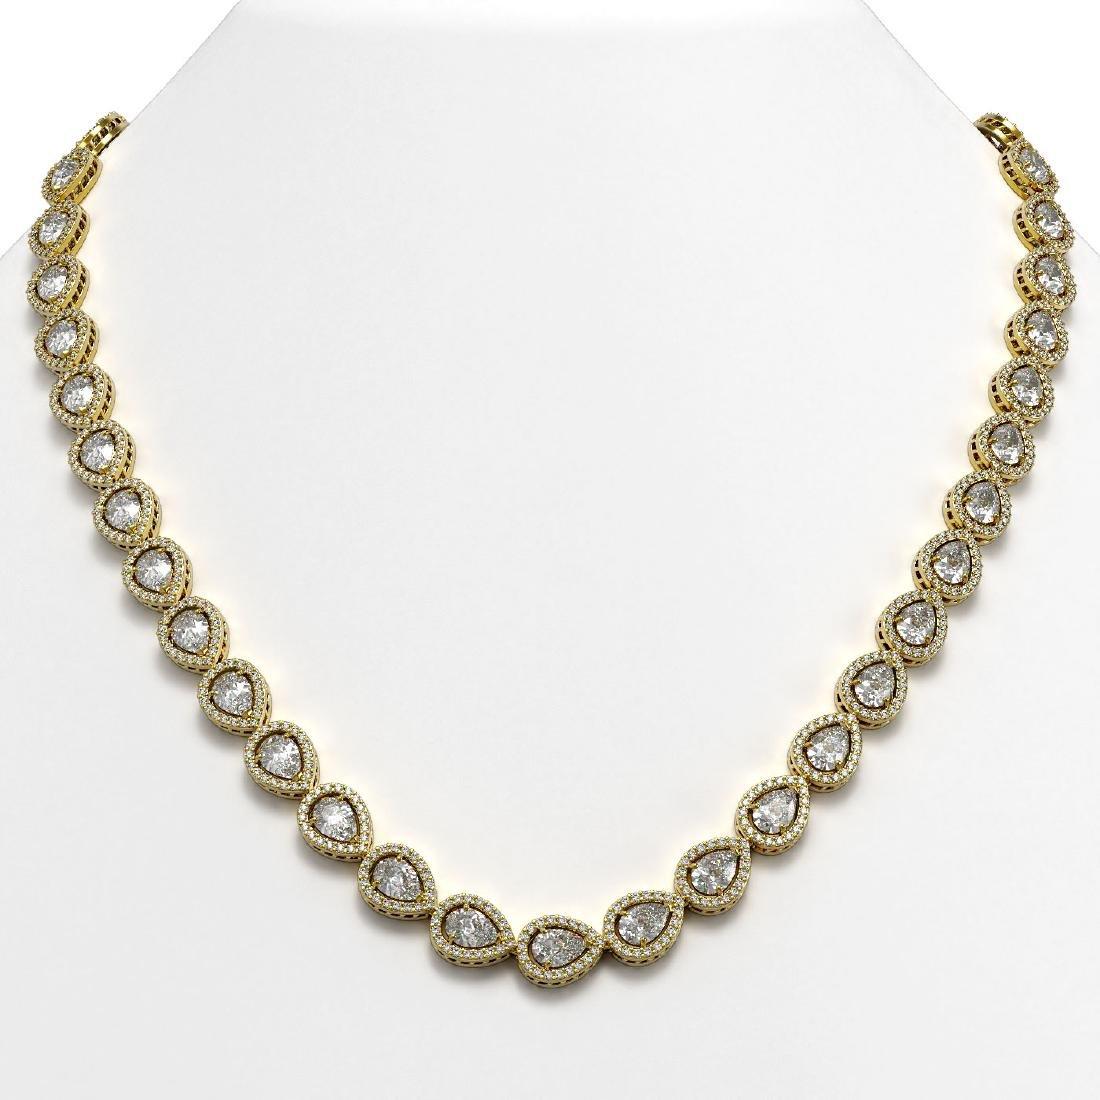 33.08 CTW Pear Diamond Designer Necklace 18K Yellow